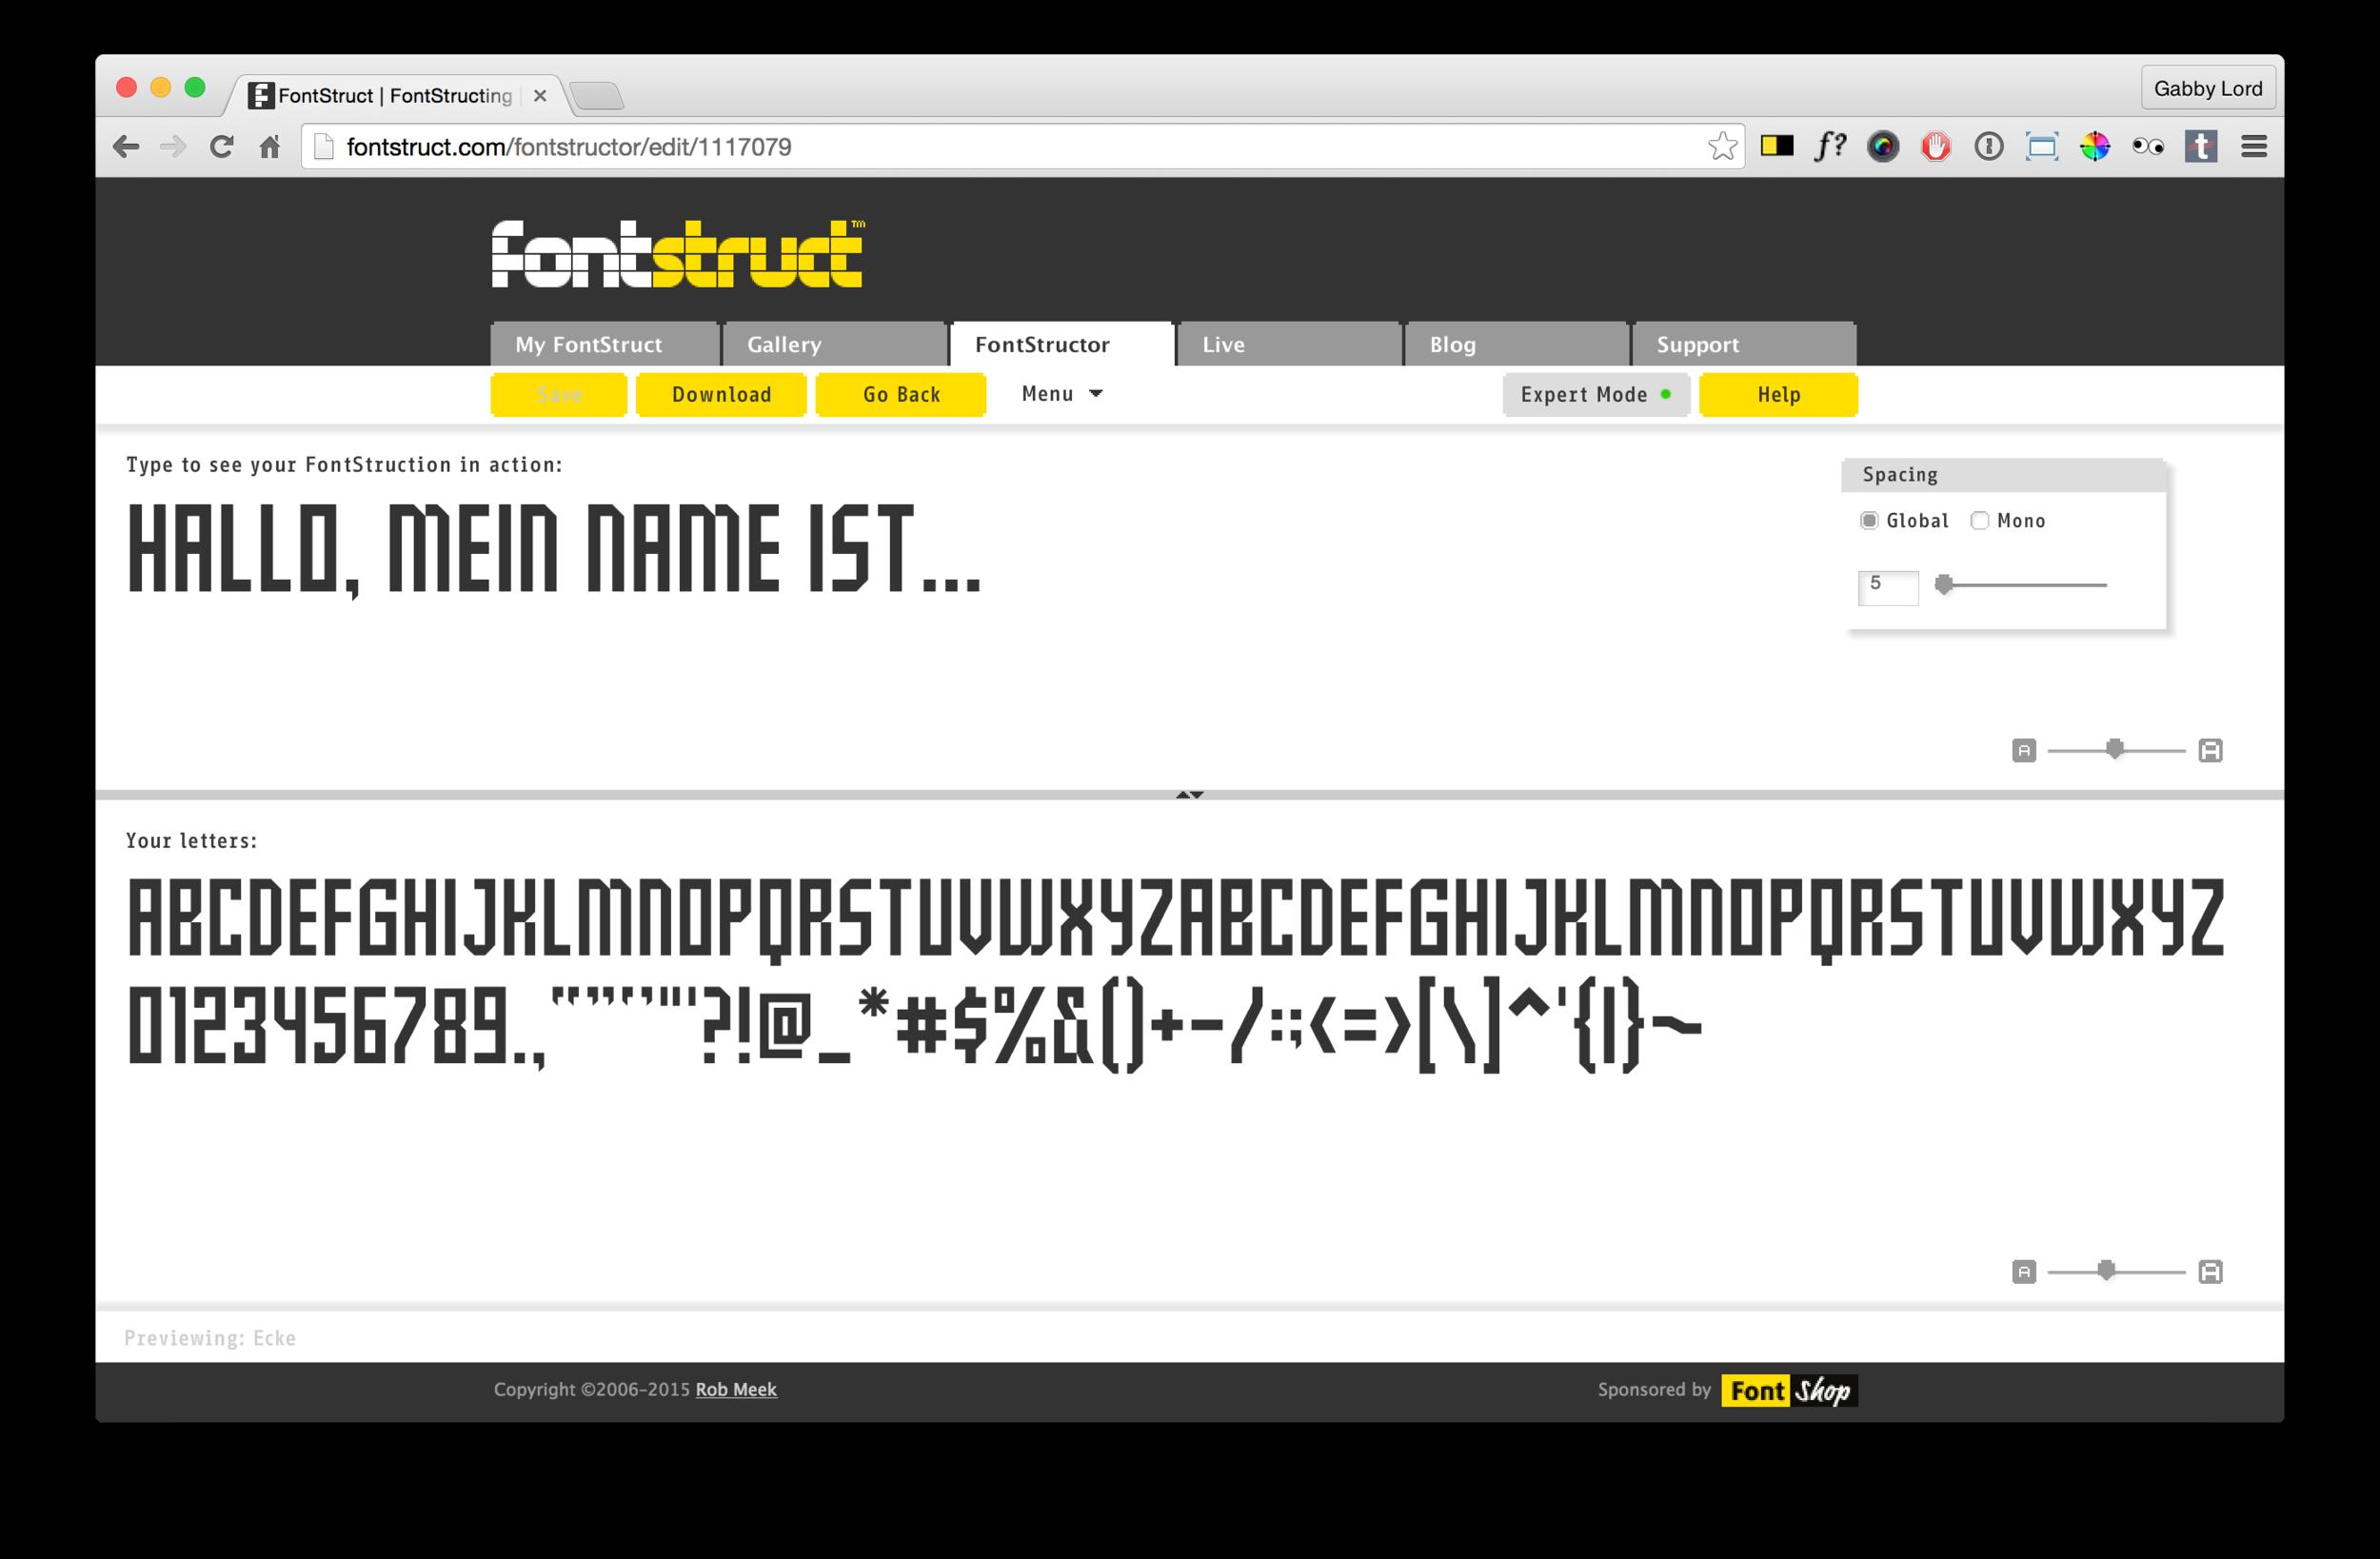 Fontstruct preview mode